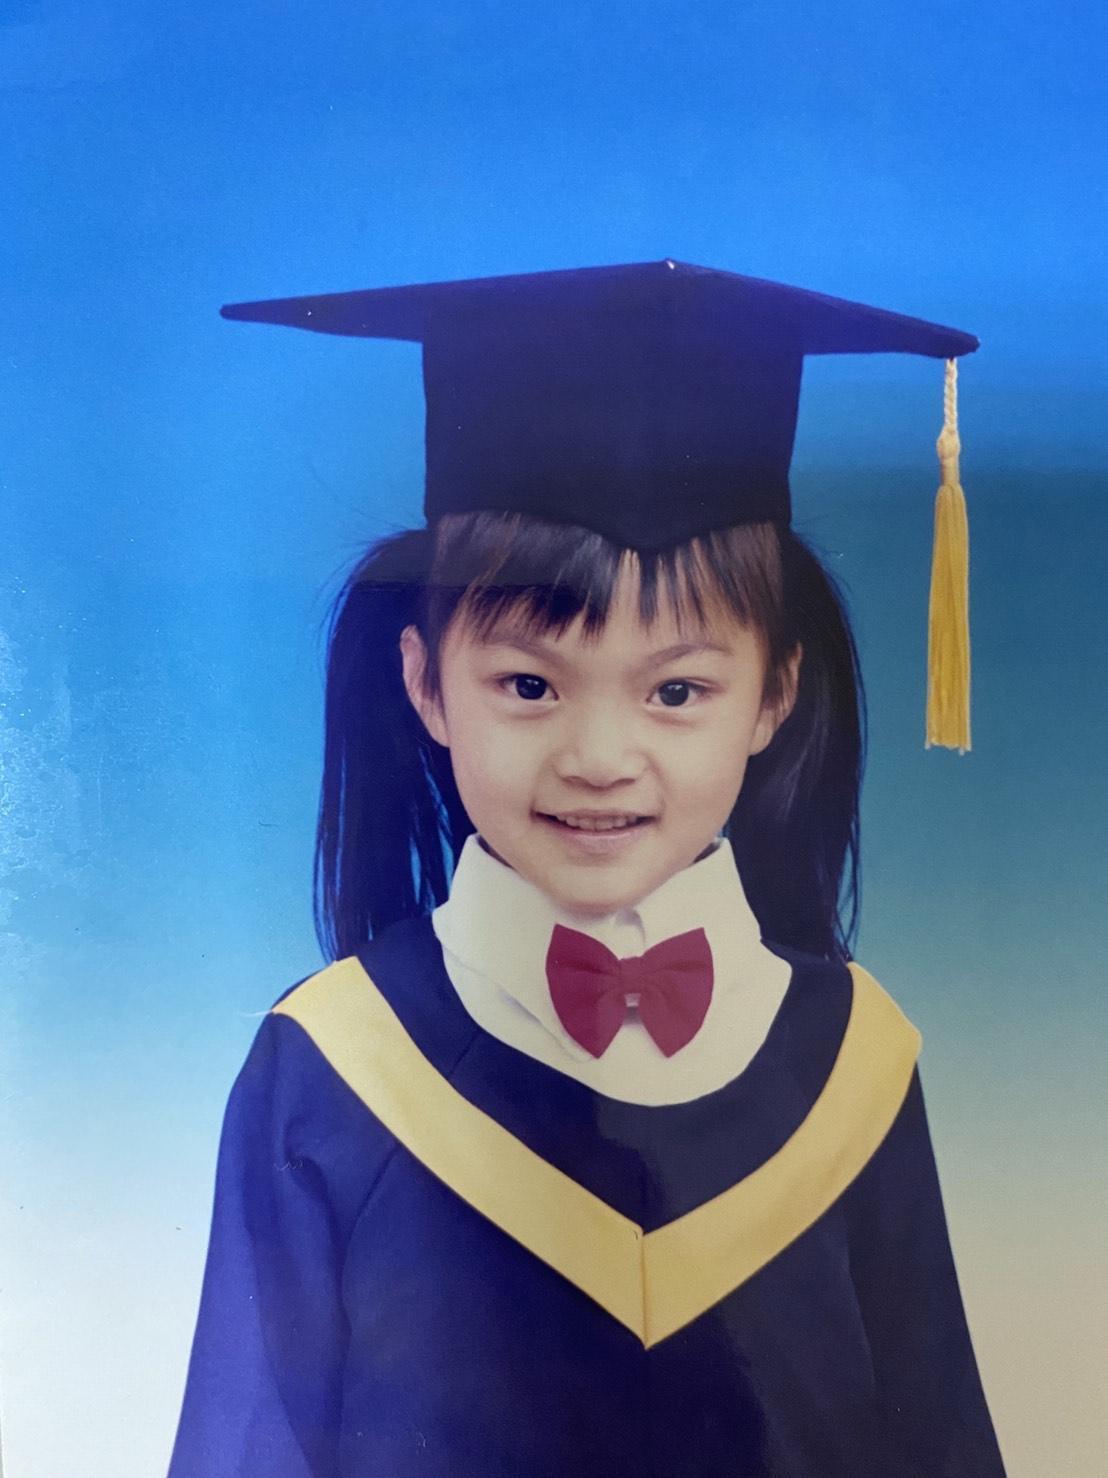 Liya莉婭小時候就是大眼、小臉,長大後五官更為精緻。(Liya莉婭提供)